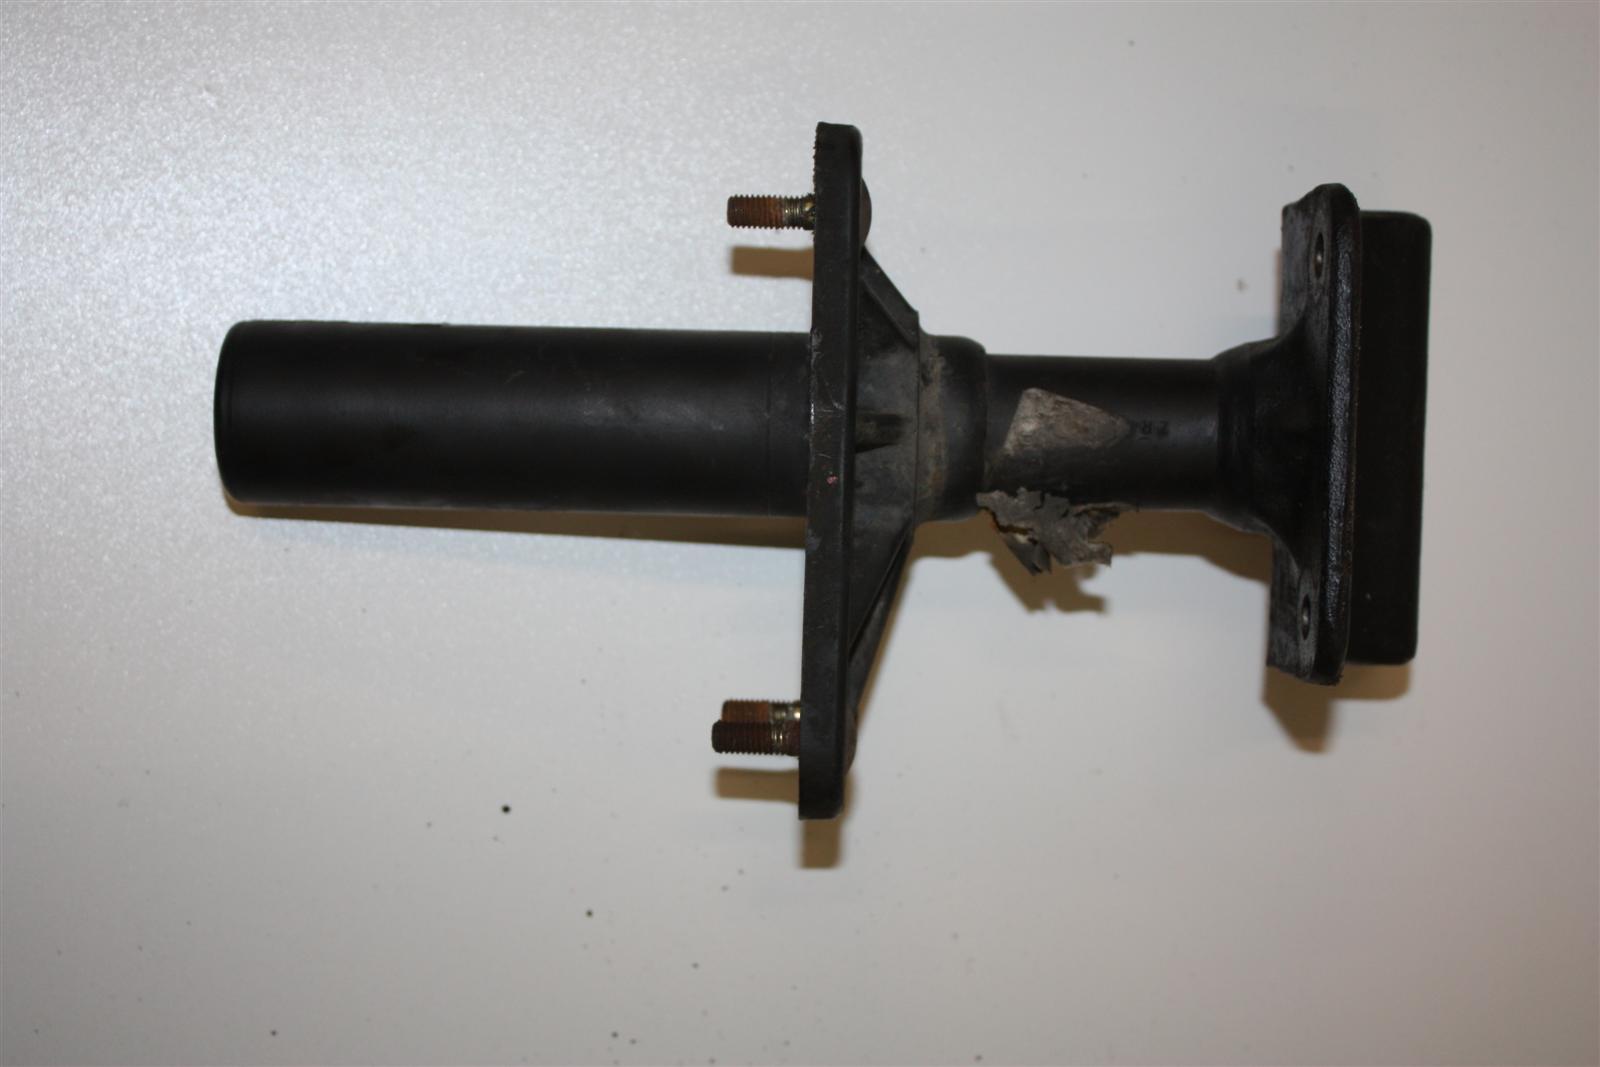 Audi V8 D11 Pralldämpfer Stoßstange Hinten Links/Rechts 441807377E